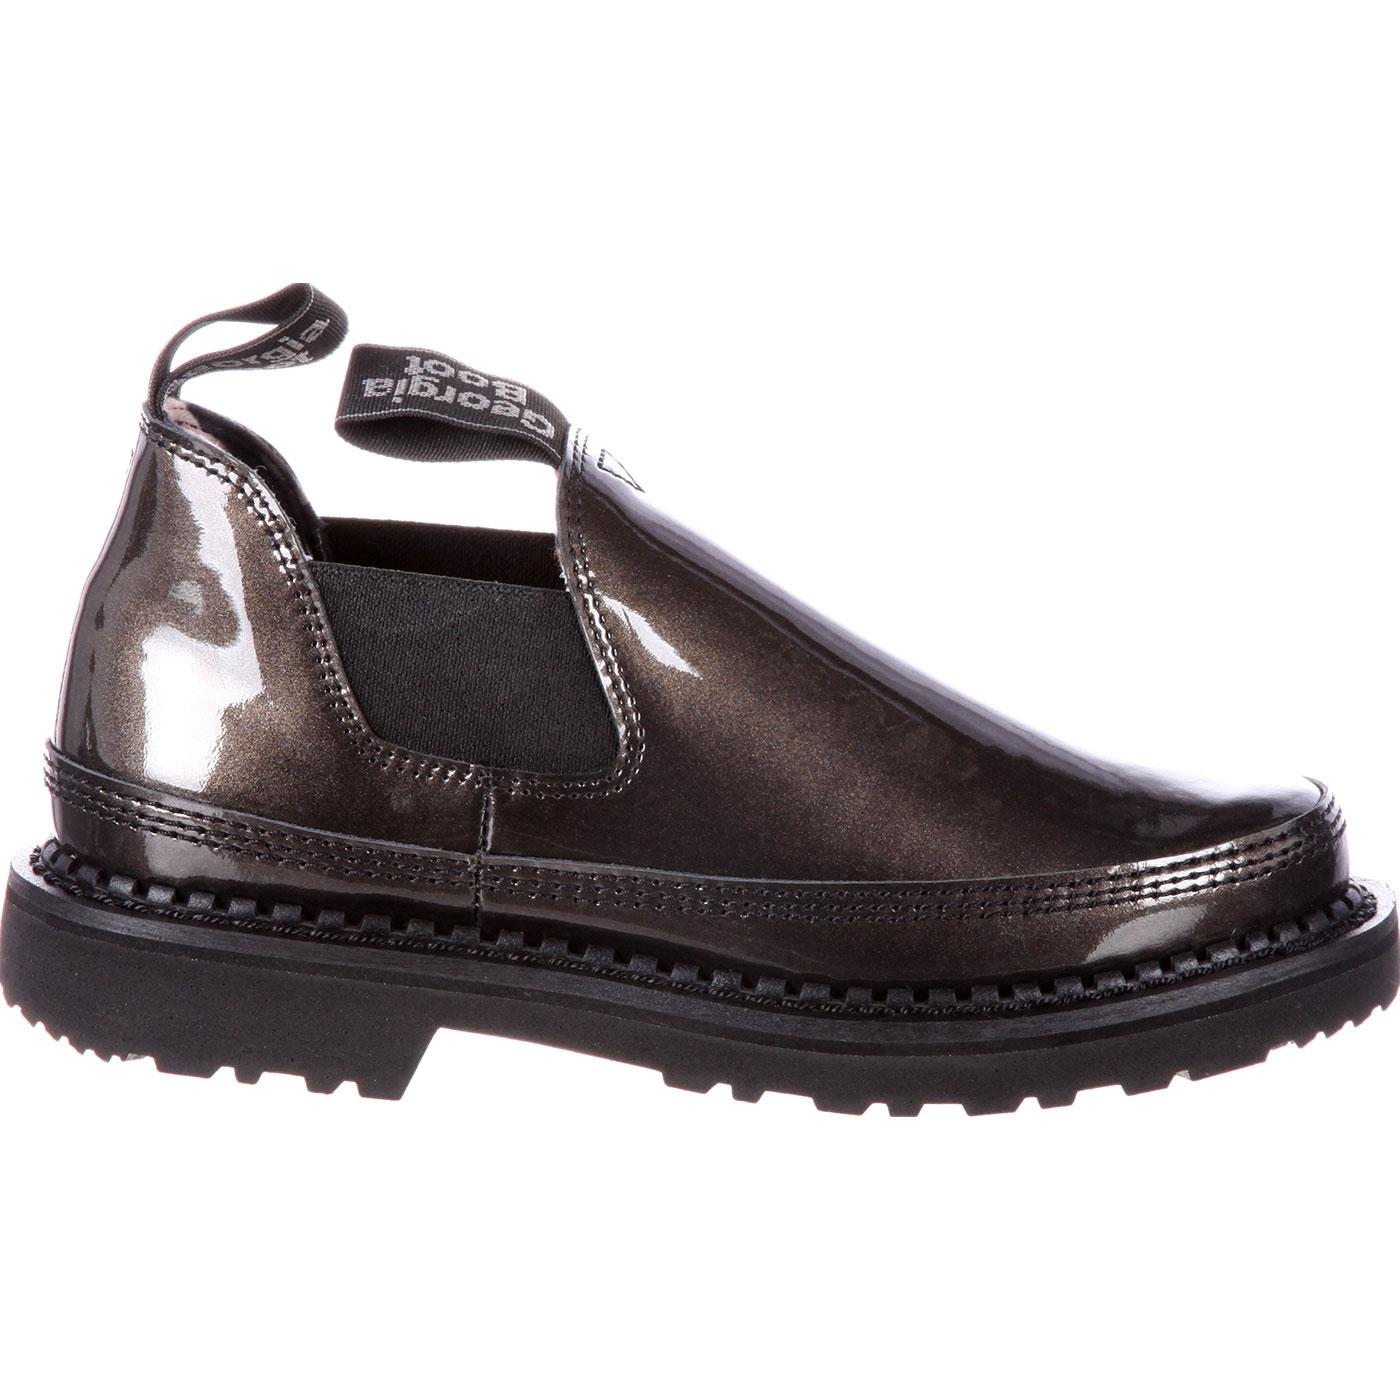 c47f192b511 Georgia Giant  Women s Black Patent Leather Romeo Shoes